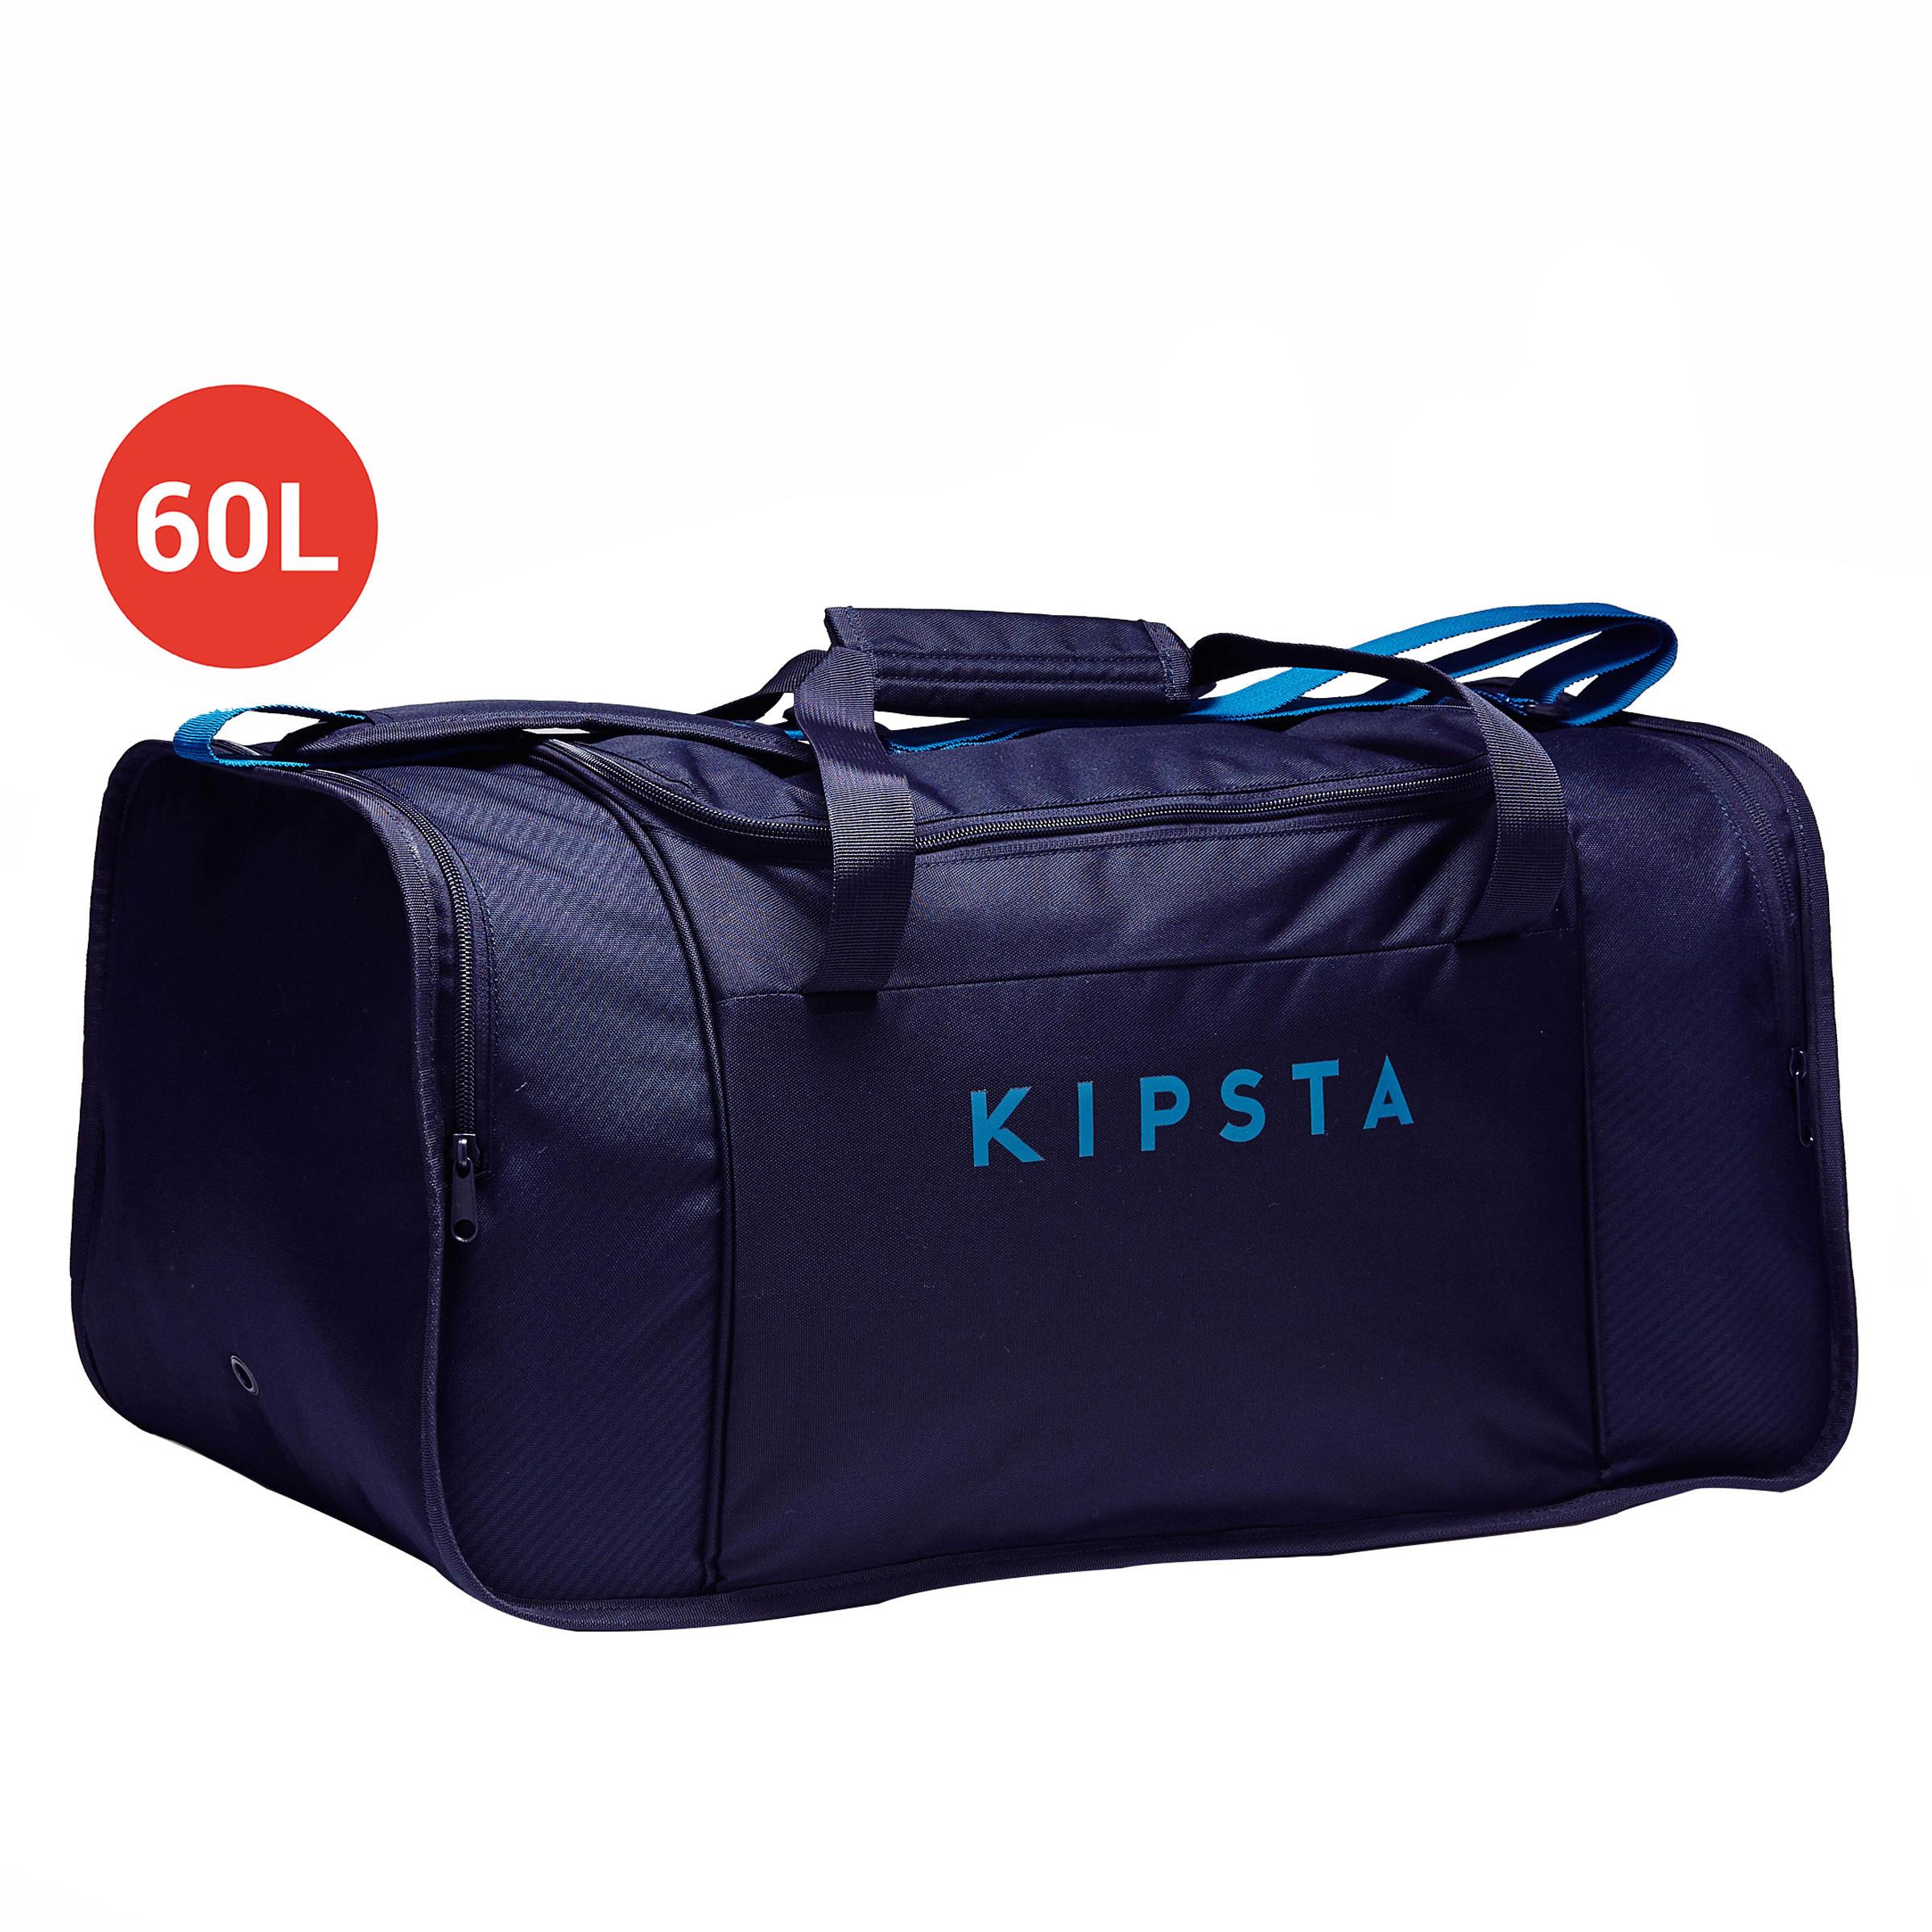 Kipsta Voetbaltas-Sporttas Kipocket 60 liter blauw